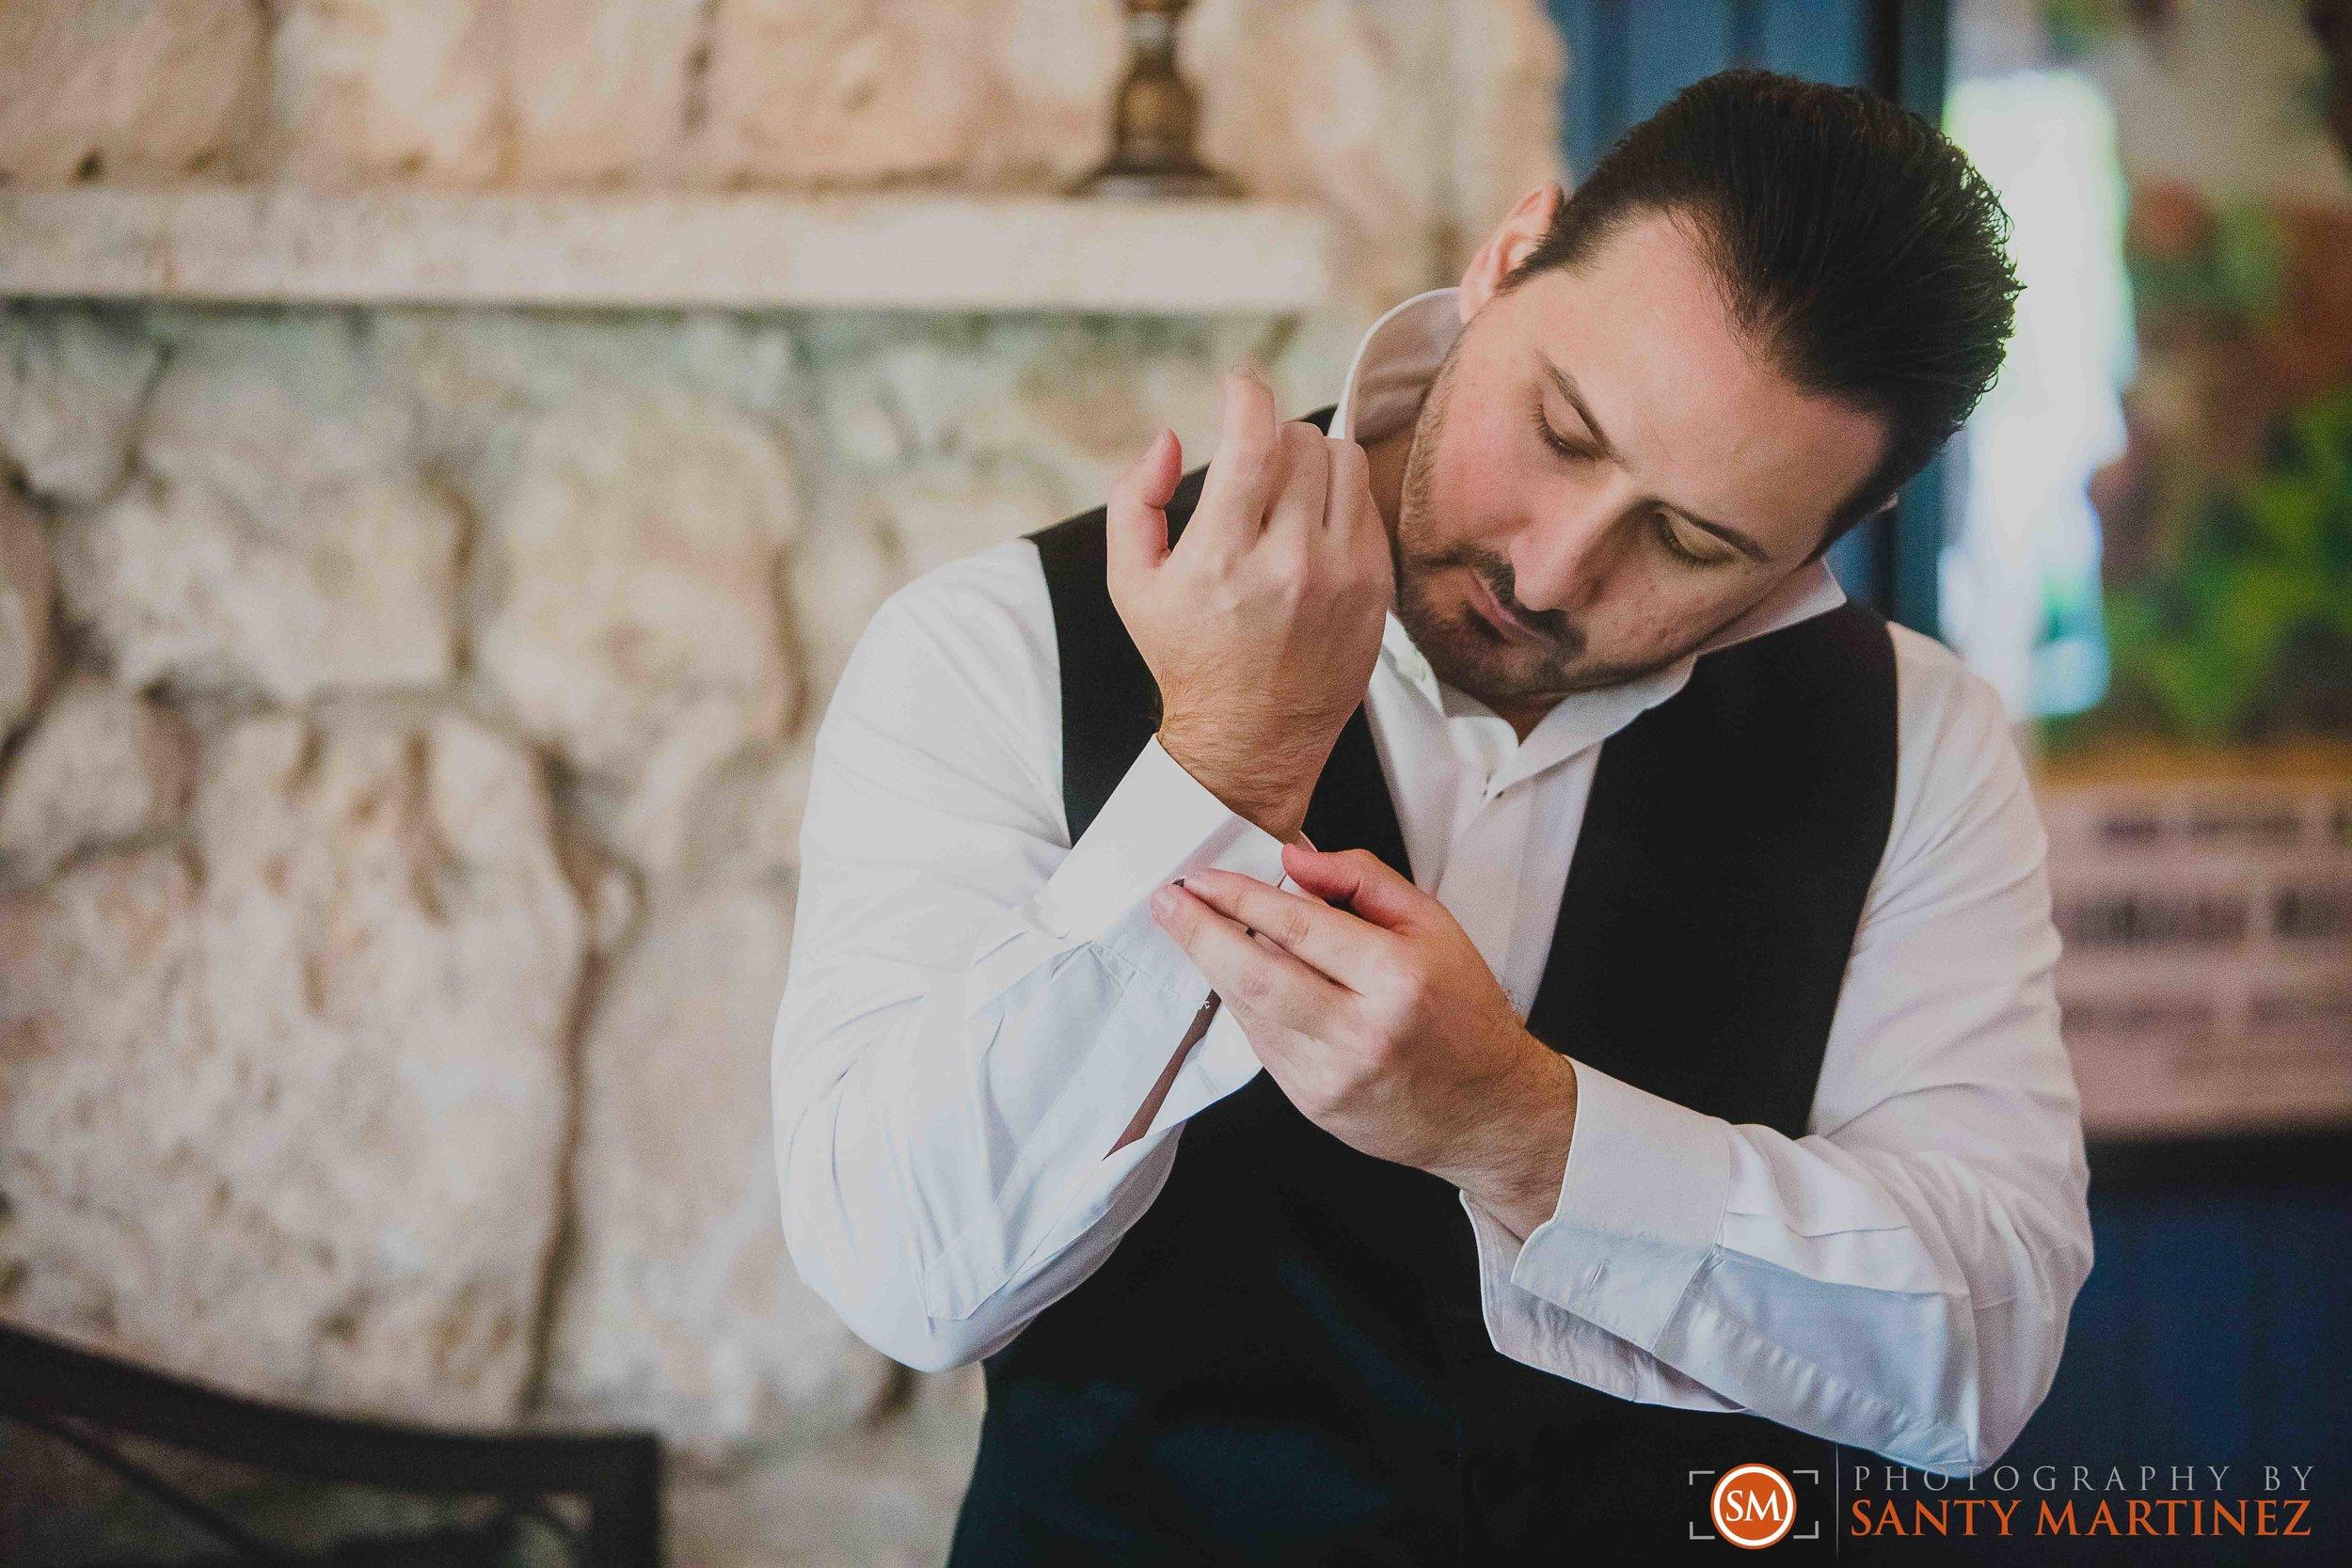 Wedding - Whimsical key West House - Photography by Santy Martinez-7.jpg